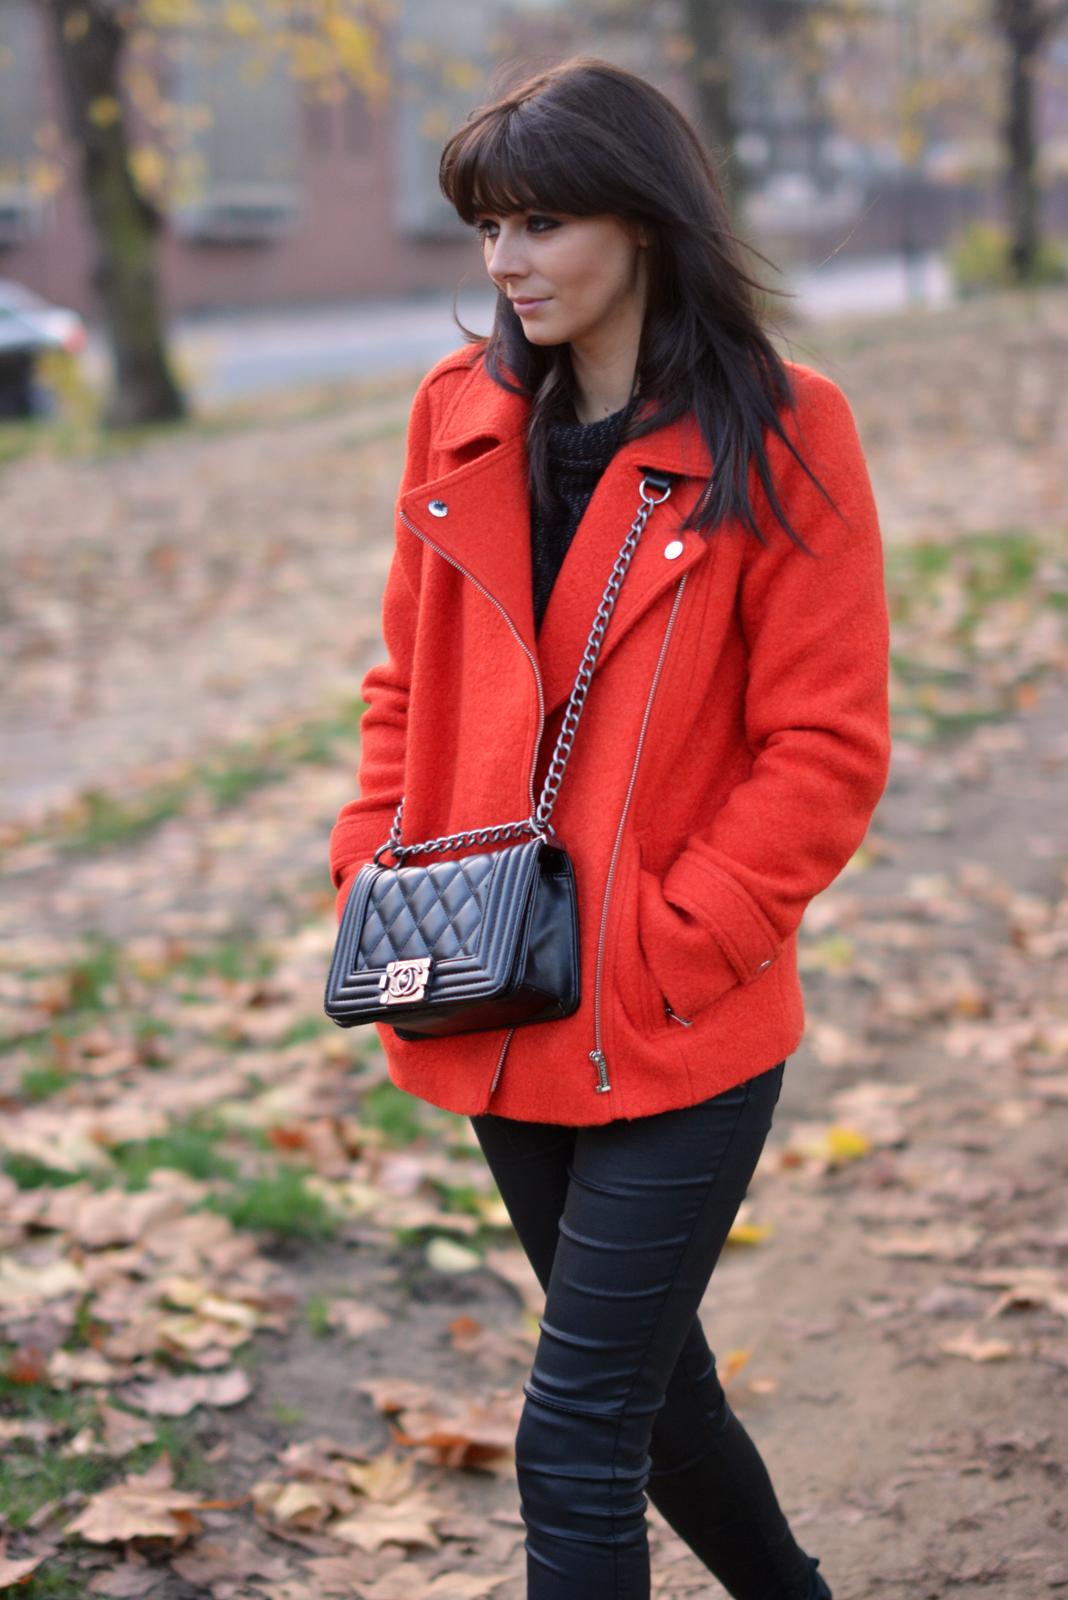 EJSTYLE - Debenhams EDITION Preen Orange Boucle biker jacket, Chanel Boy Bag Black, Fashion Blogger, autumn fall street style London, Hyde park